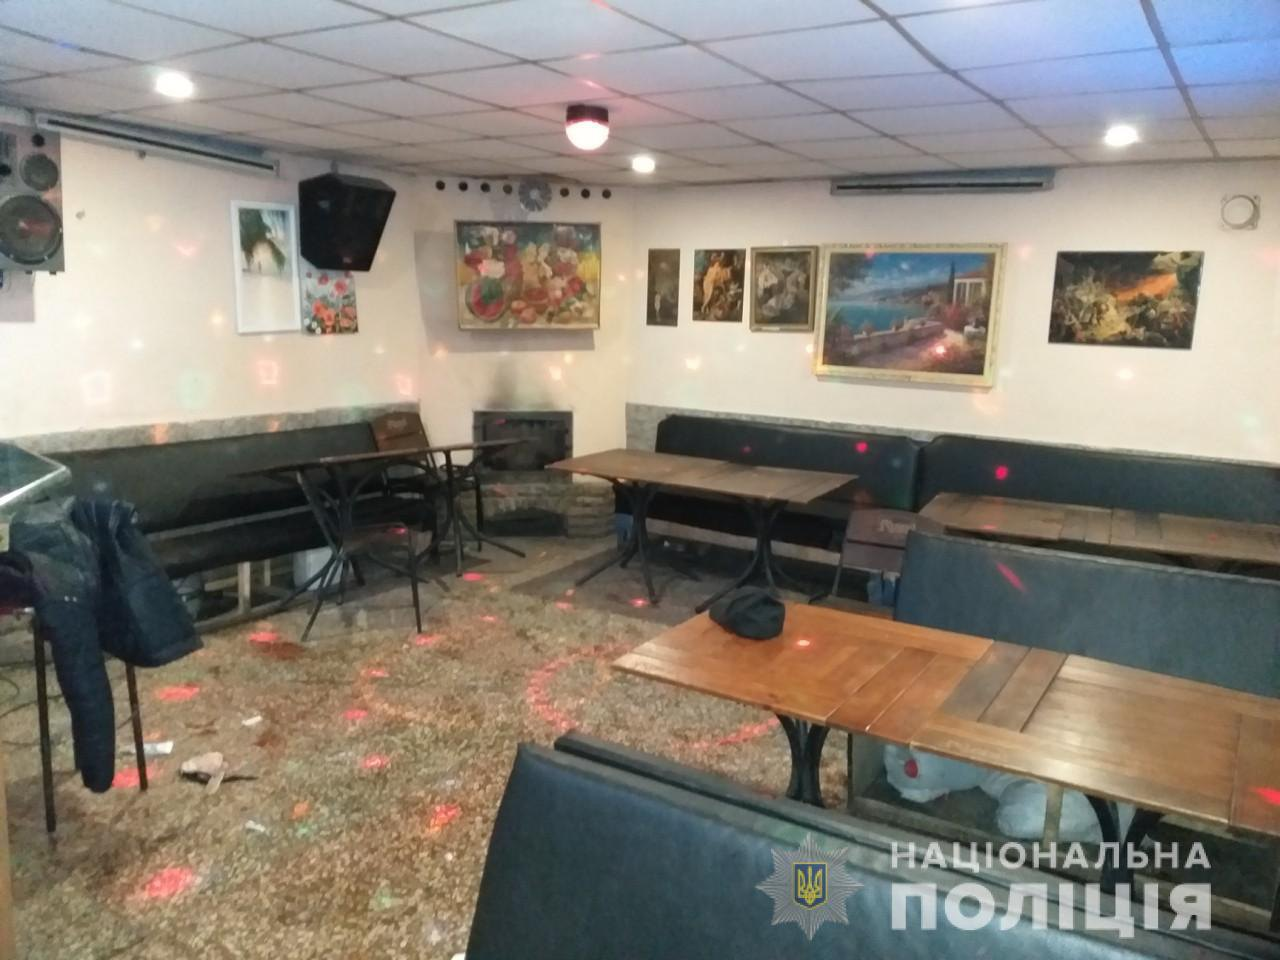 Кафе в Харкові, де стався напад